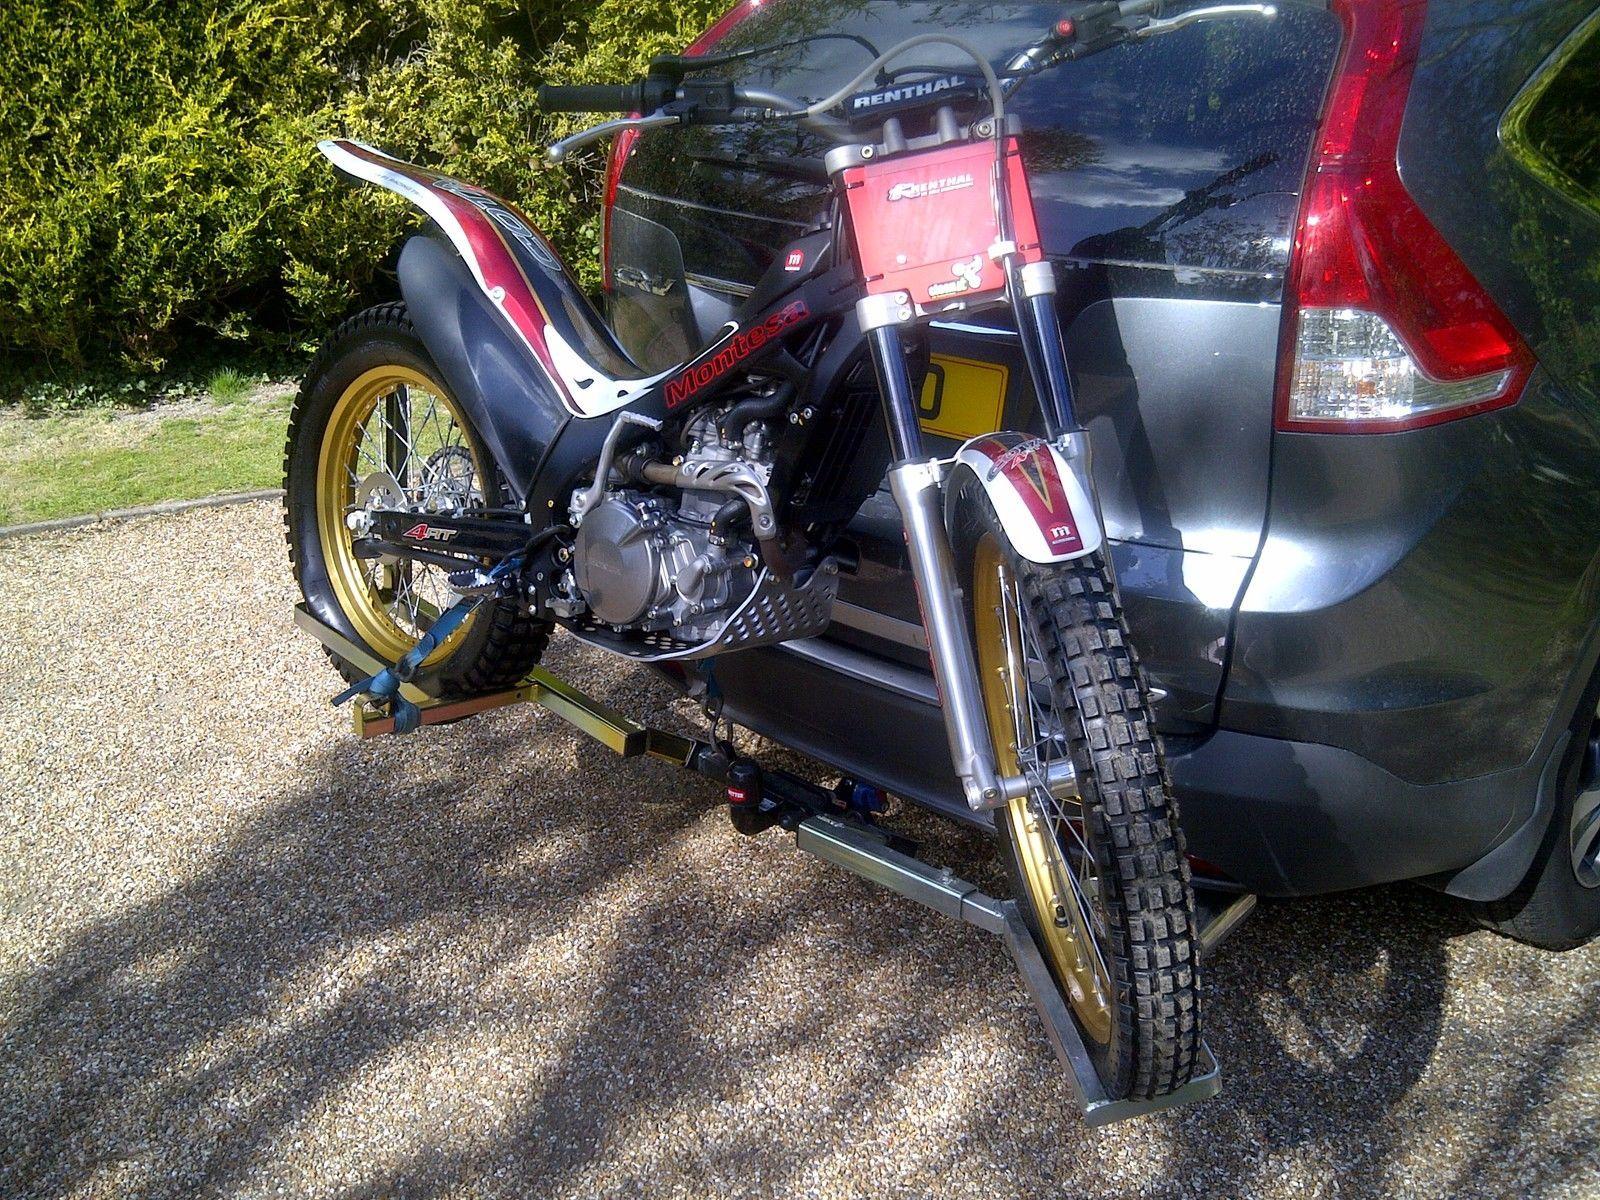 Trials Motocross Enduro 4x4 Motorbike Carrier Rack Ebay